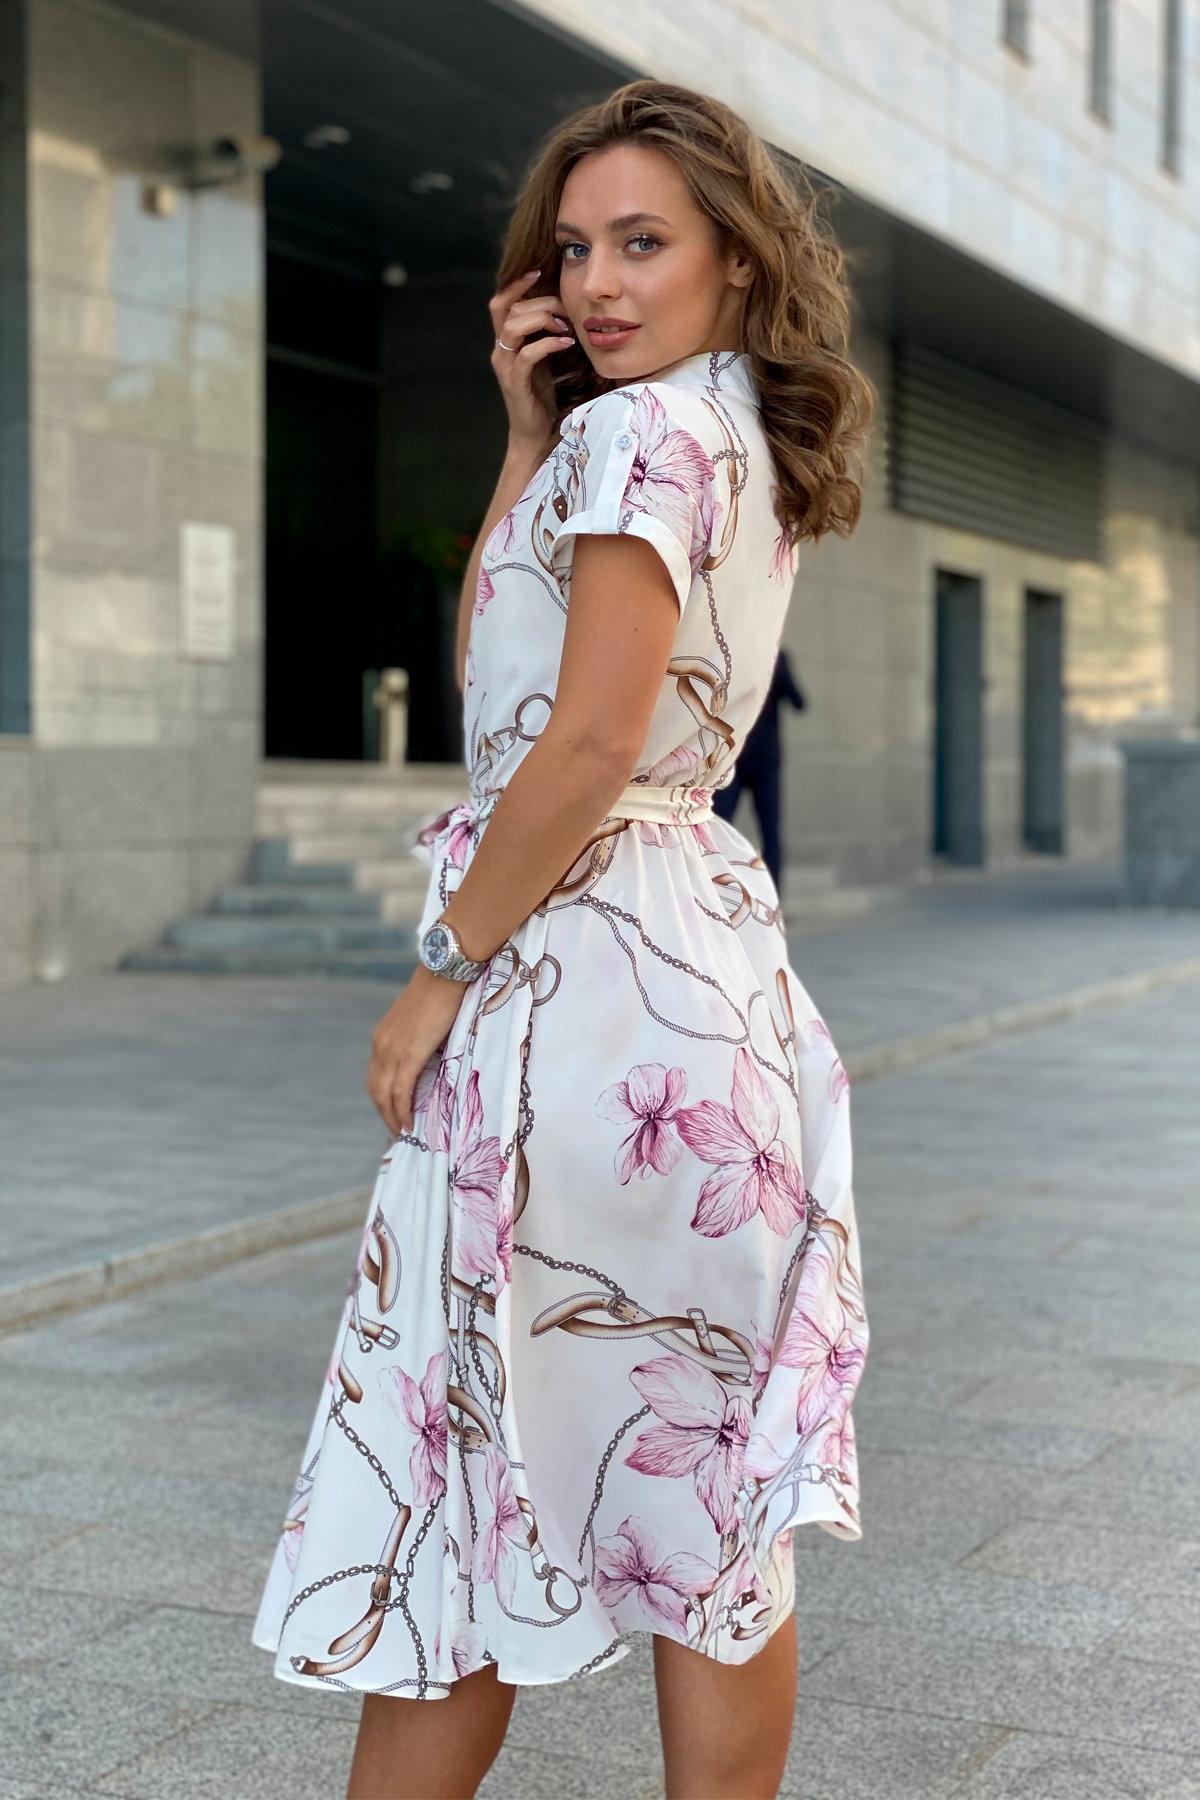 Платье Санжар 9090 АРТ. 45966 Цвет: Цветы кр/цепи Молоко/пудра - фото 2, интернет магазин tm-modus.ru